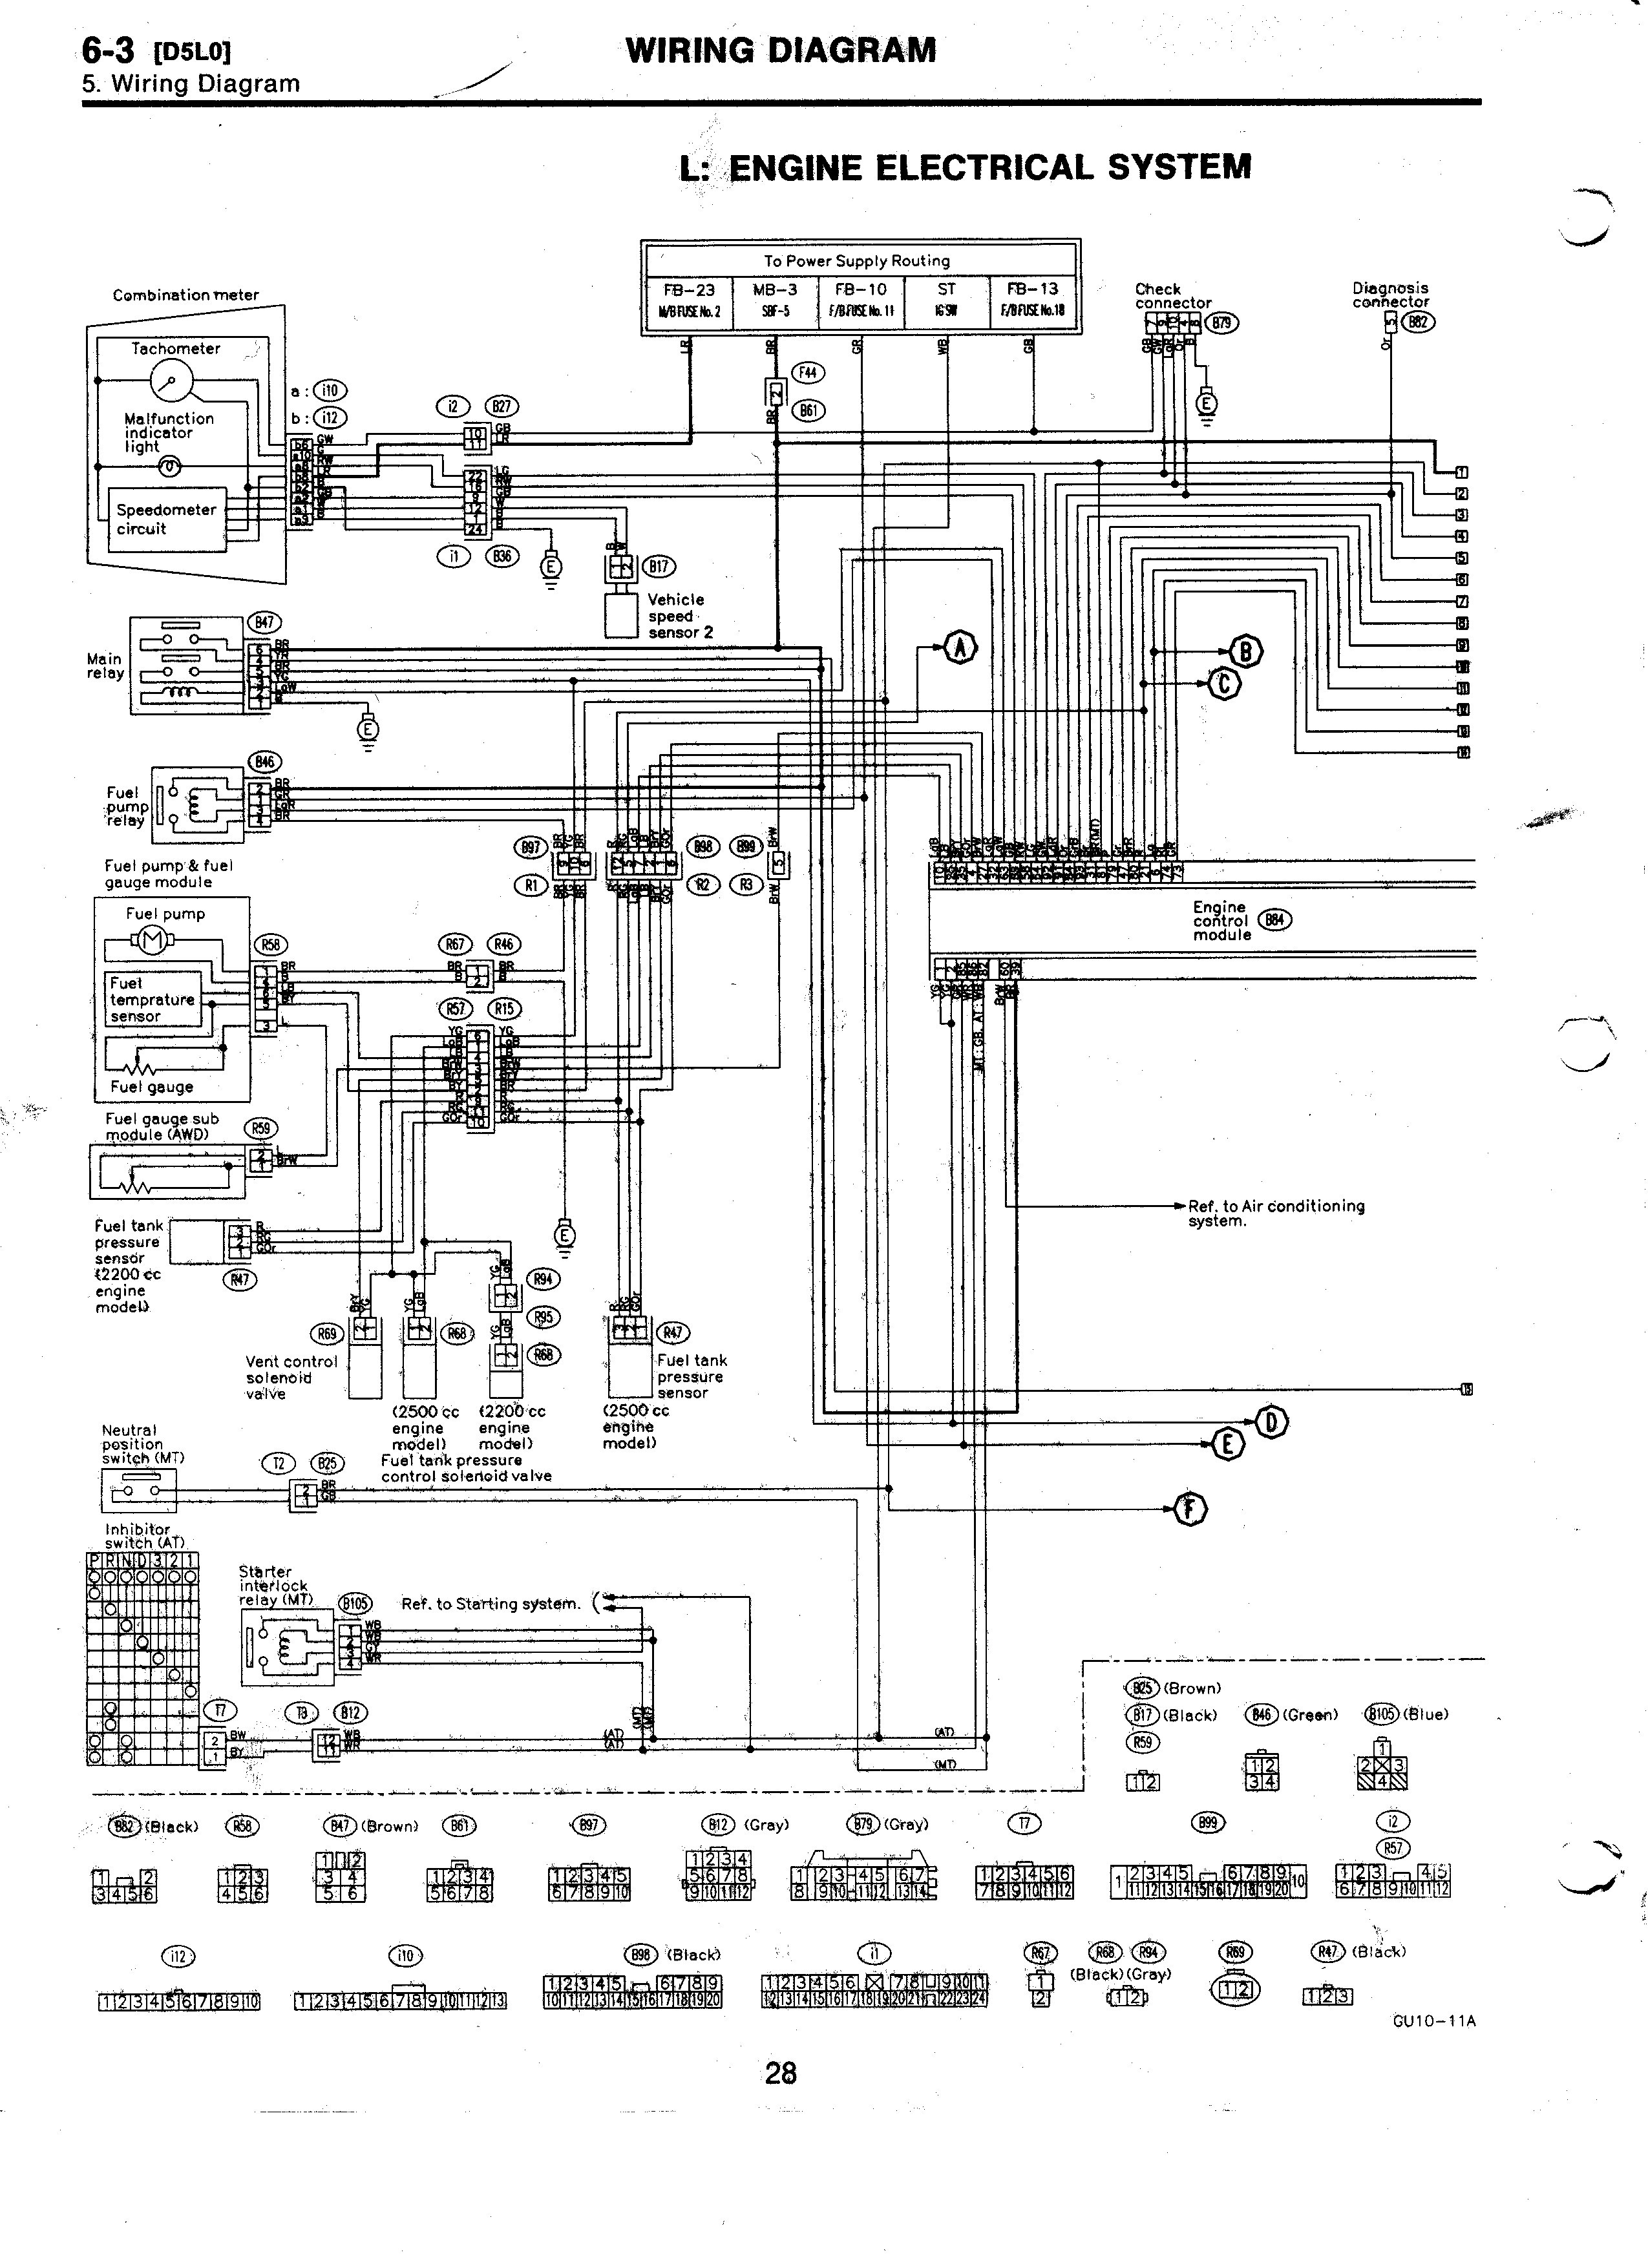 subaru legacy alternator wiring wiring diagram \u2022 ford model t wiring-diagram subaru legacy engine diagram 2 impreza horn wiring diagram best 1998 rh detoxicrecenze com alternator light wiring 2003 dodge alternator wiring